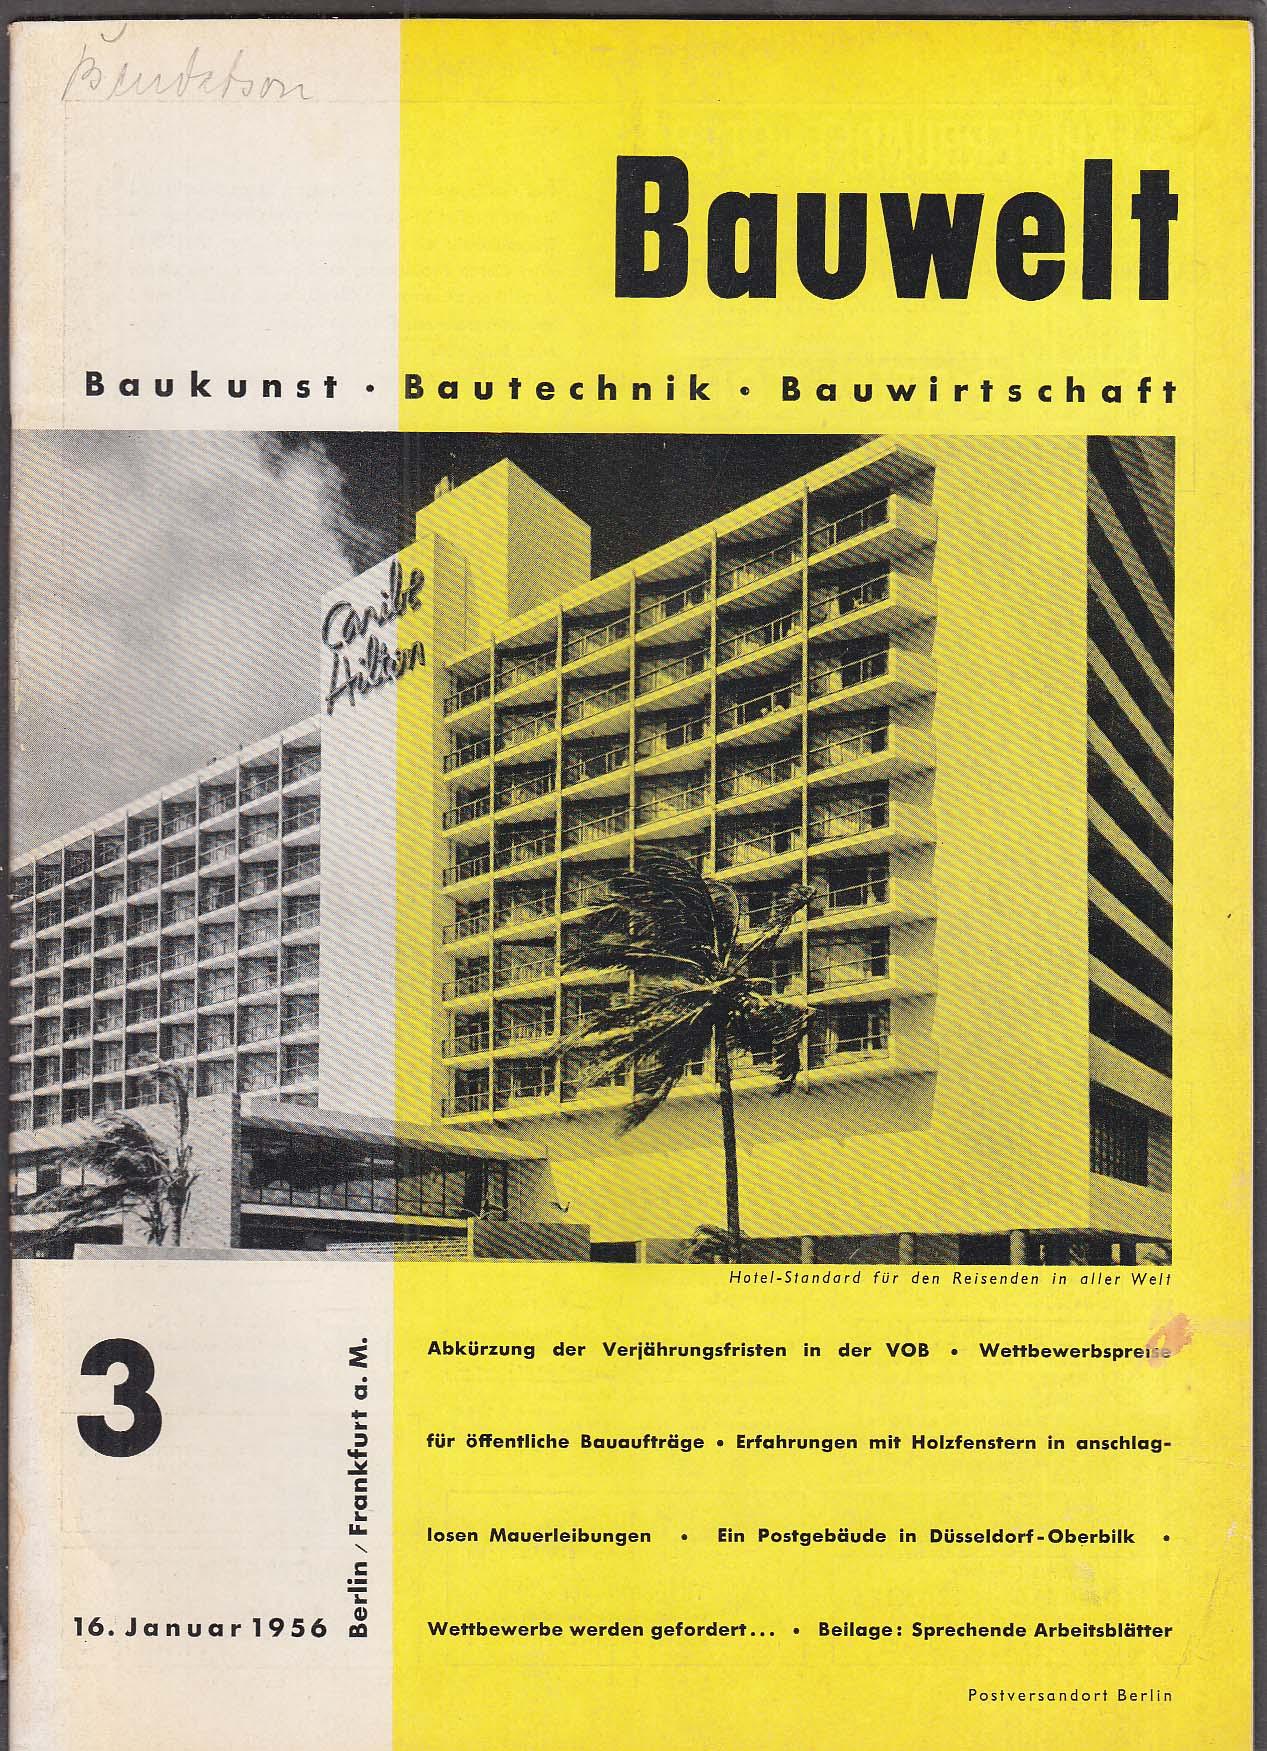 Bauwelt German architecture magazine 1/16/1956 3